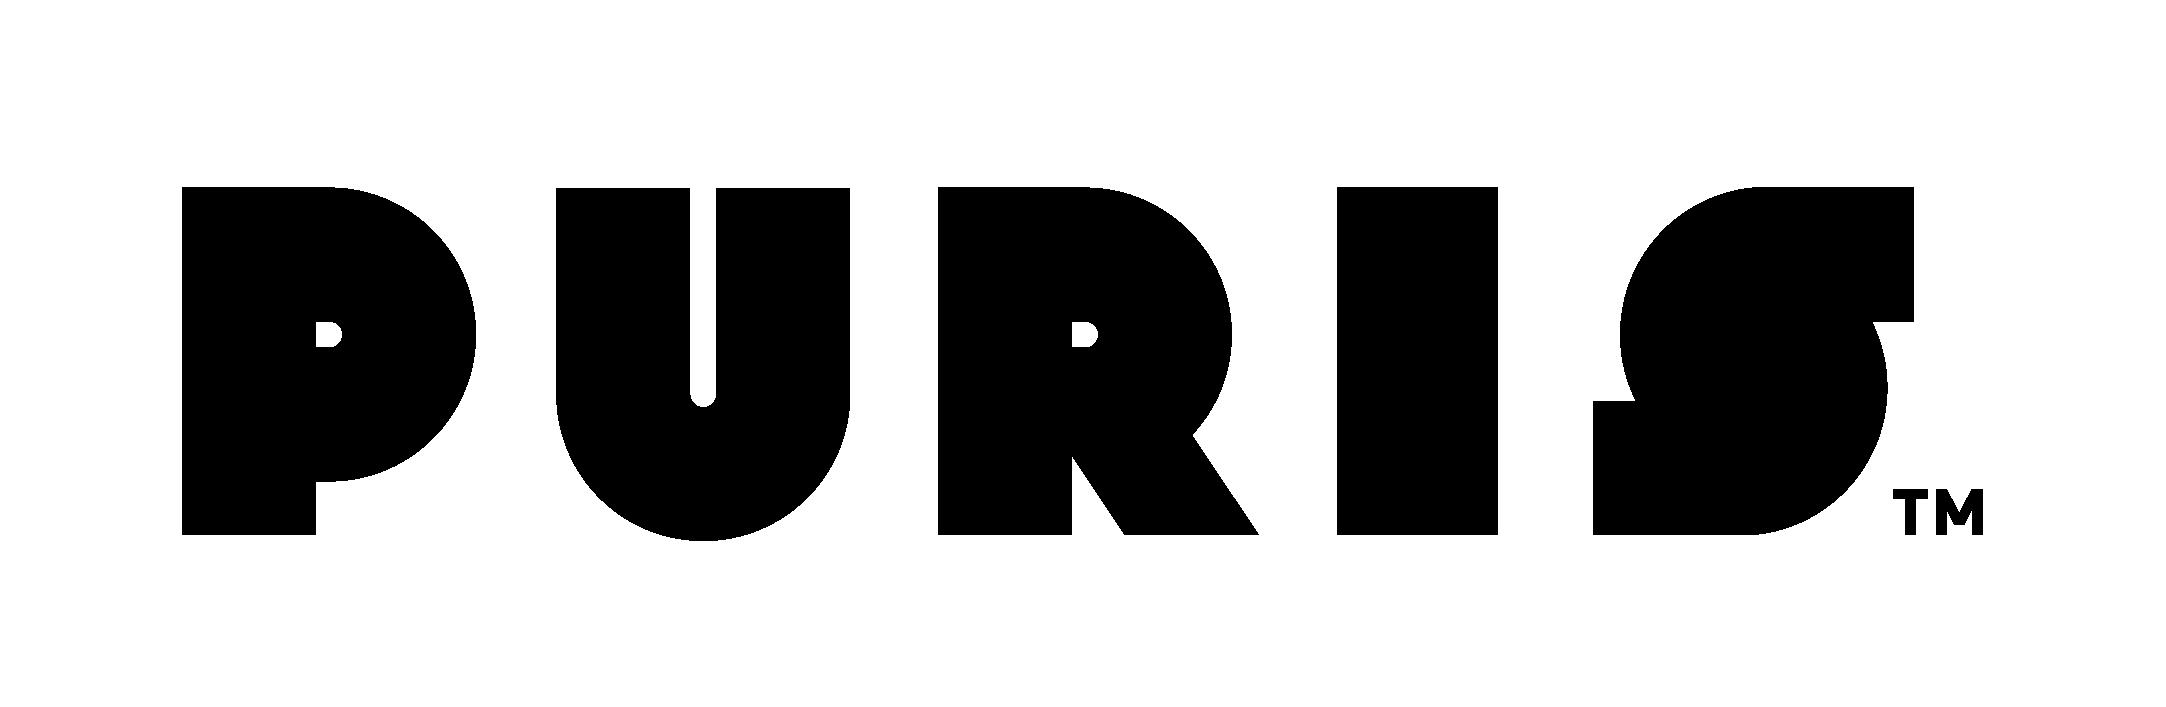 PURIS_wordmark_black